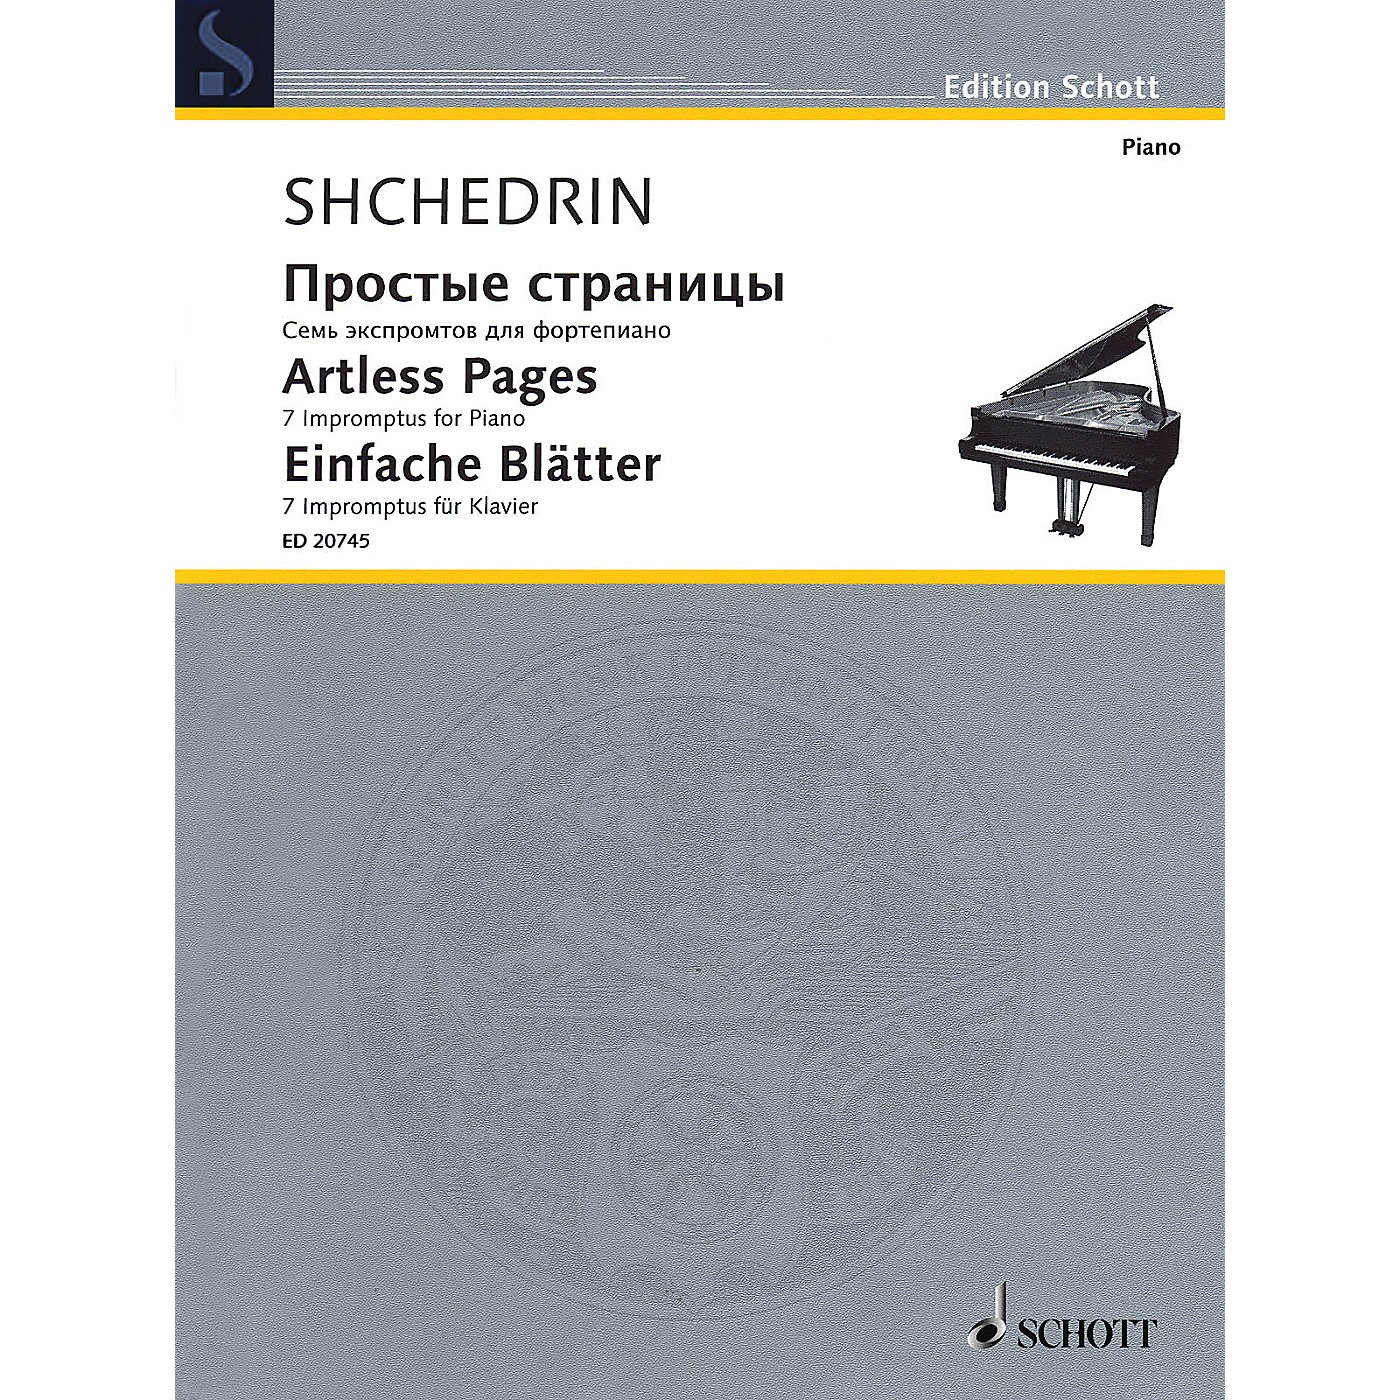 Schott Artless Pages (Seven Impromptus Piano) Schott Series thumbnail